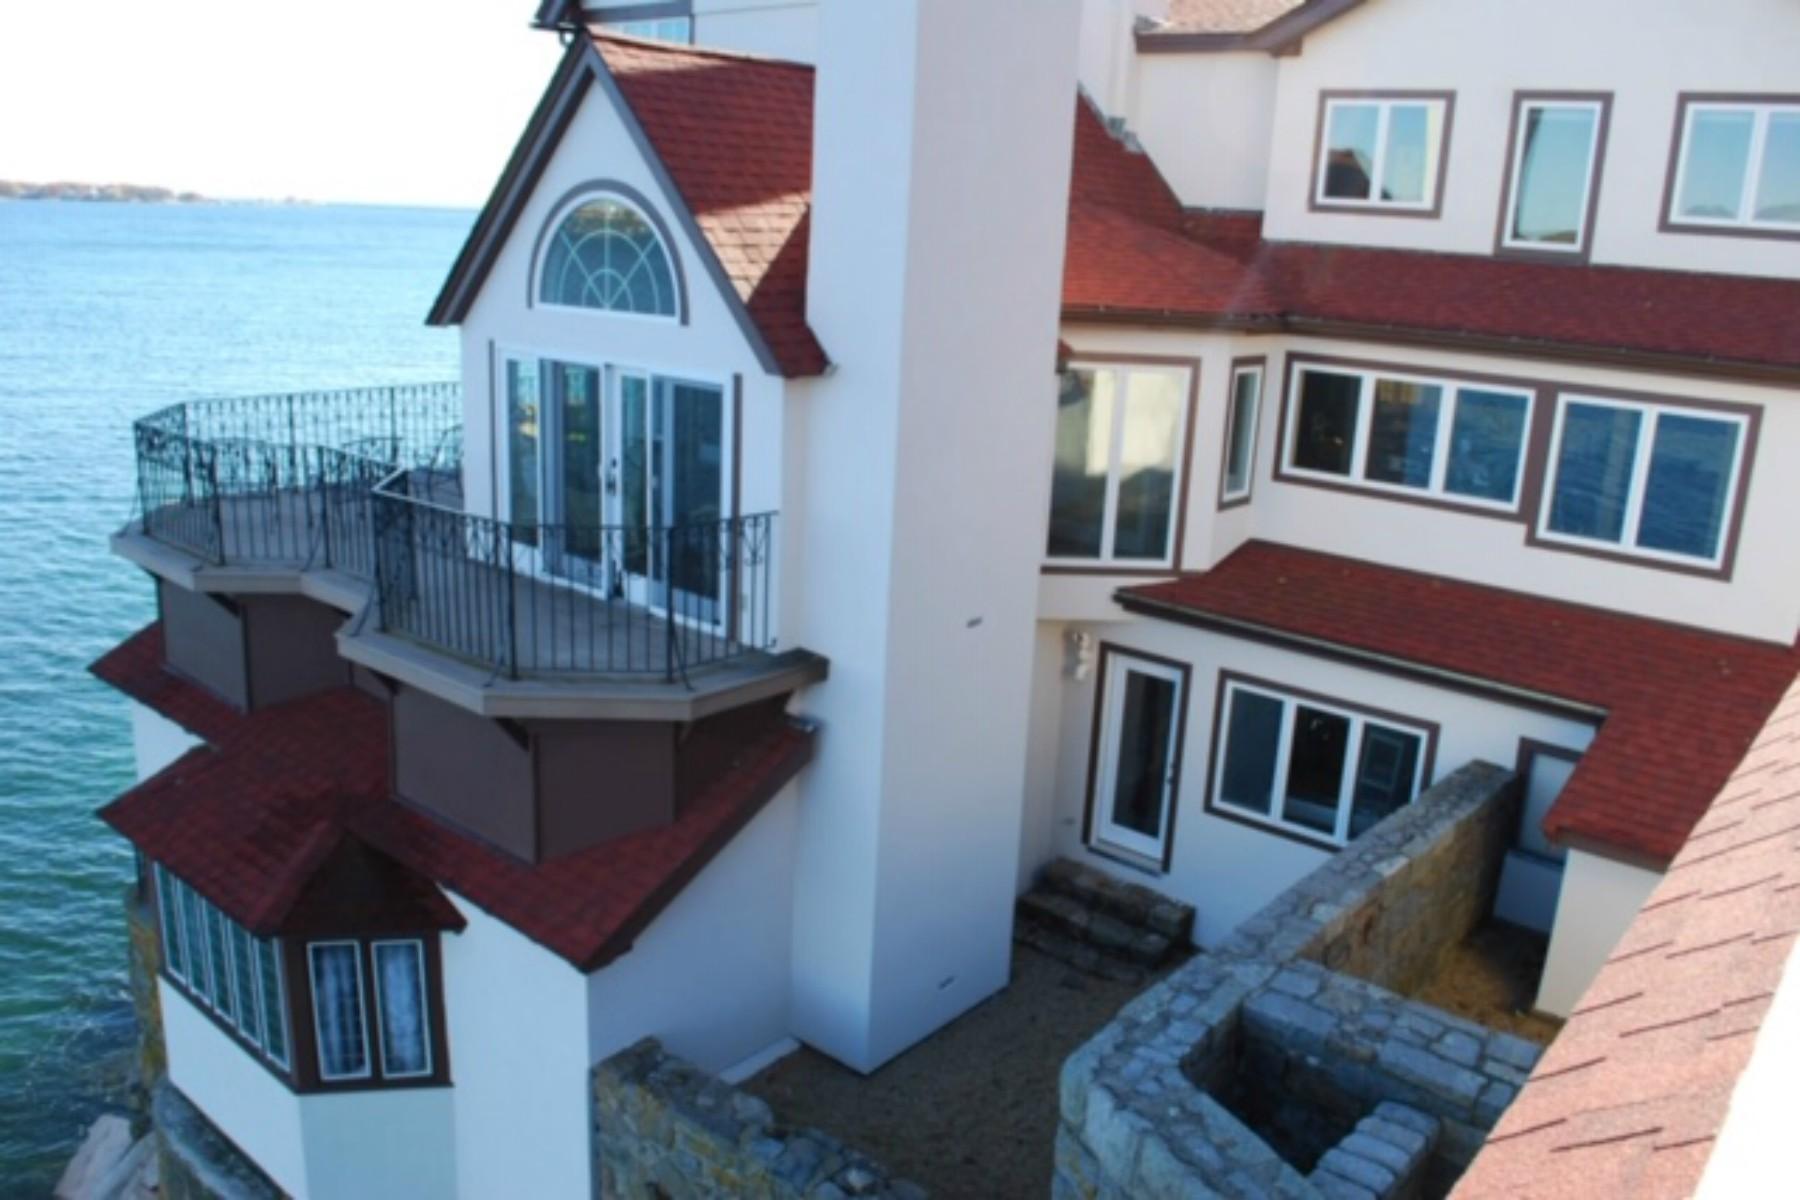 Single Family Homes for Sale at Historic Coastal Property 160 Western Avenue Gloucester, Massachusetts 01930 United States